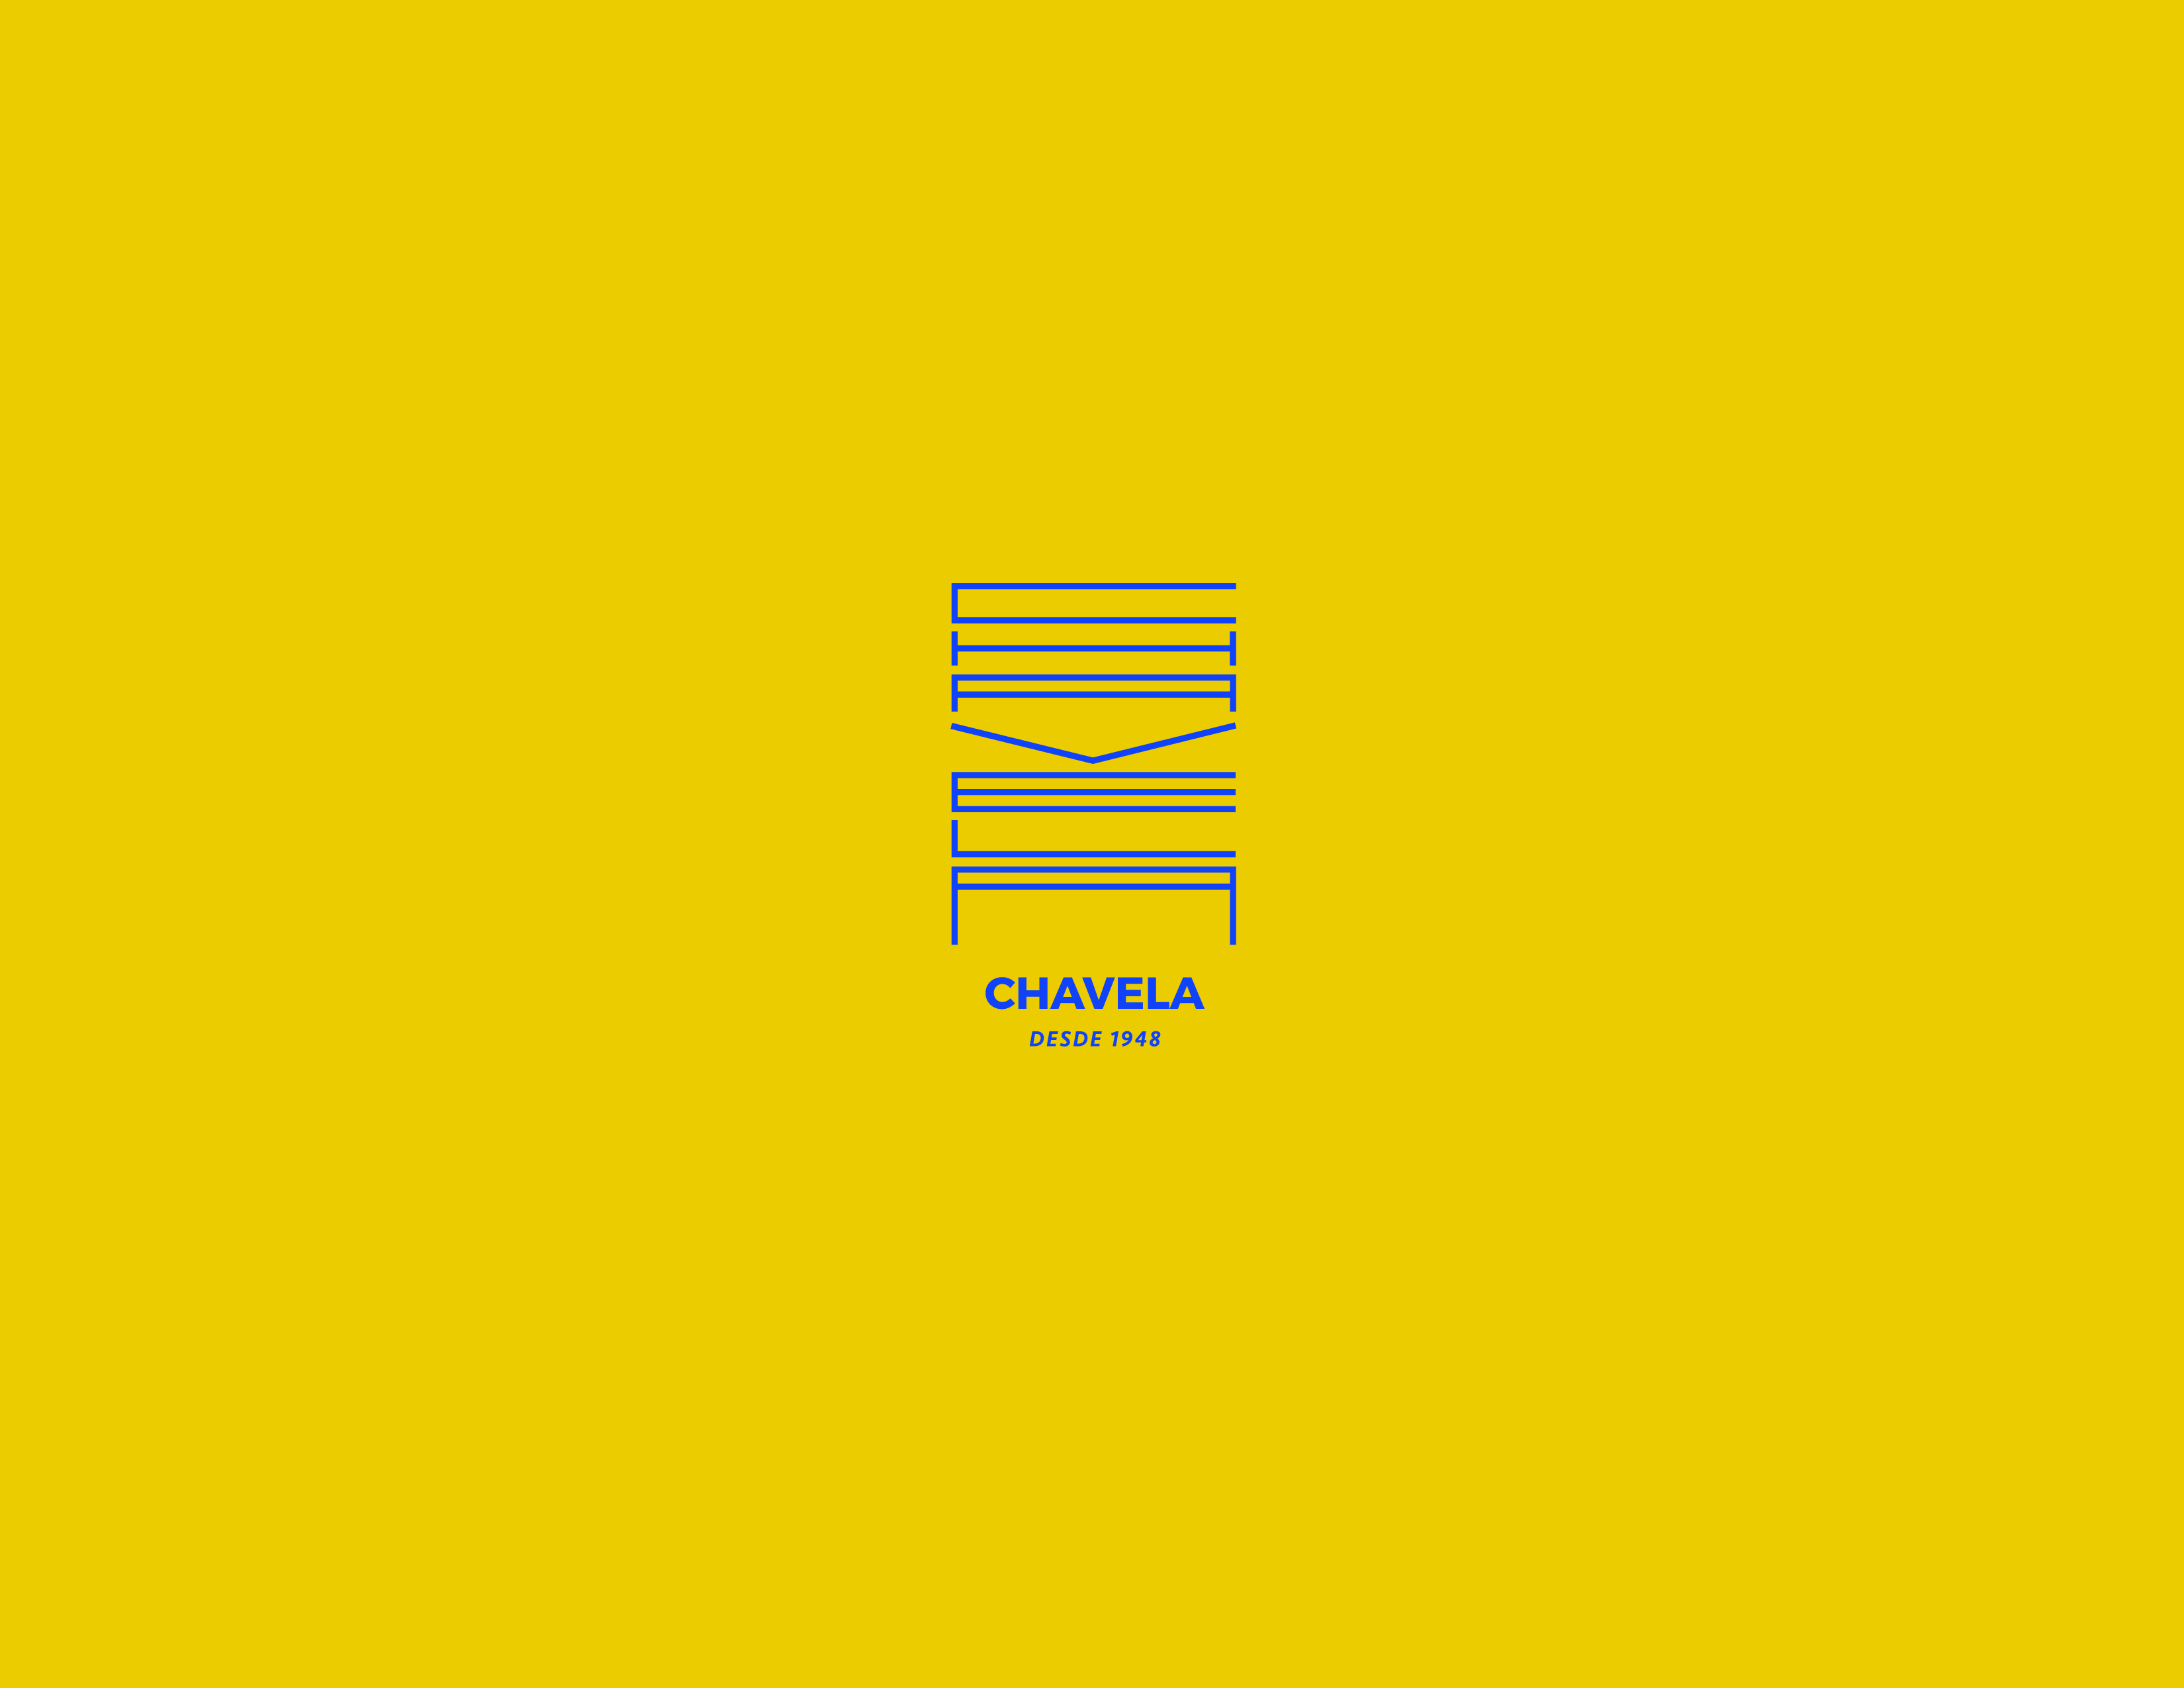 Chavela Desde 1984